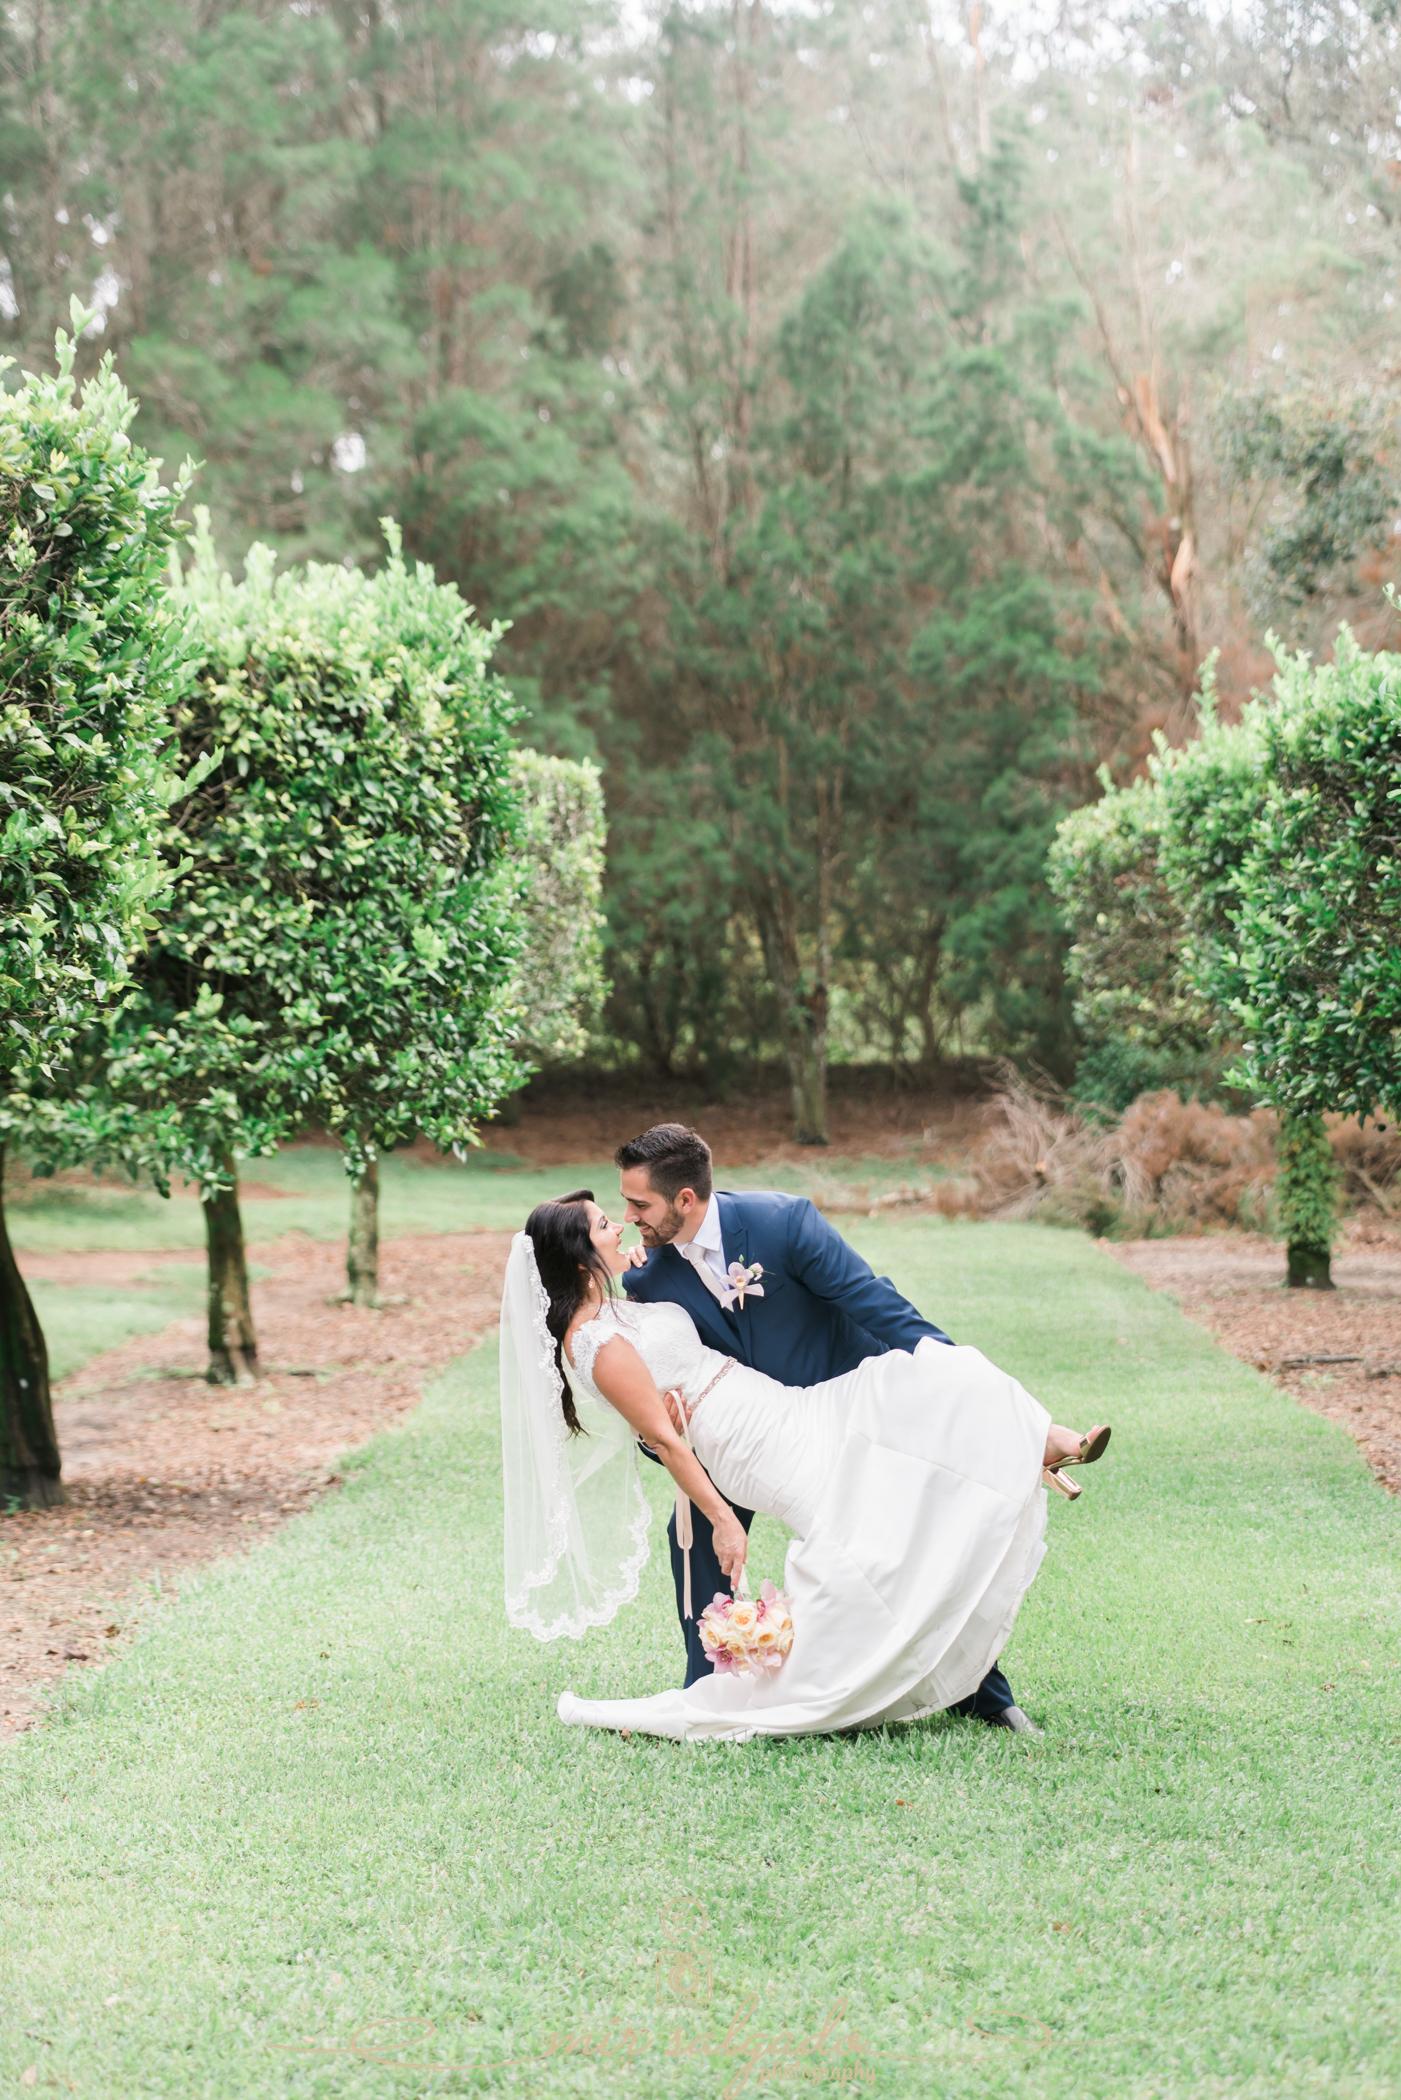 Bok-tower-gardens-wedding-photo, bride-and-groom-wedding-photo, Tampa-wedding-photographer